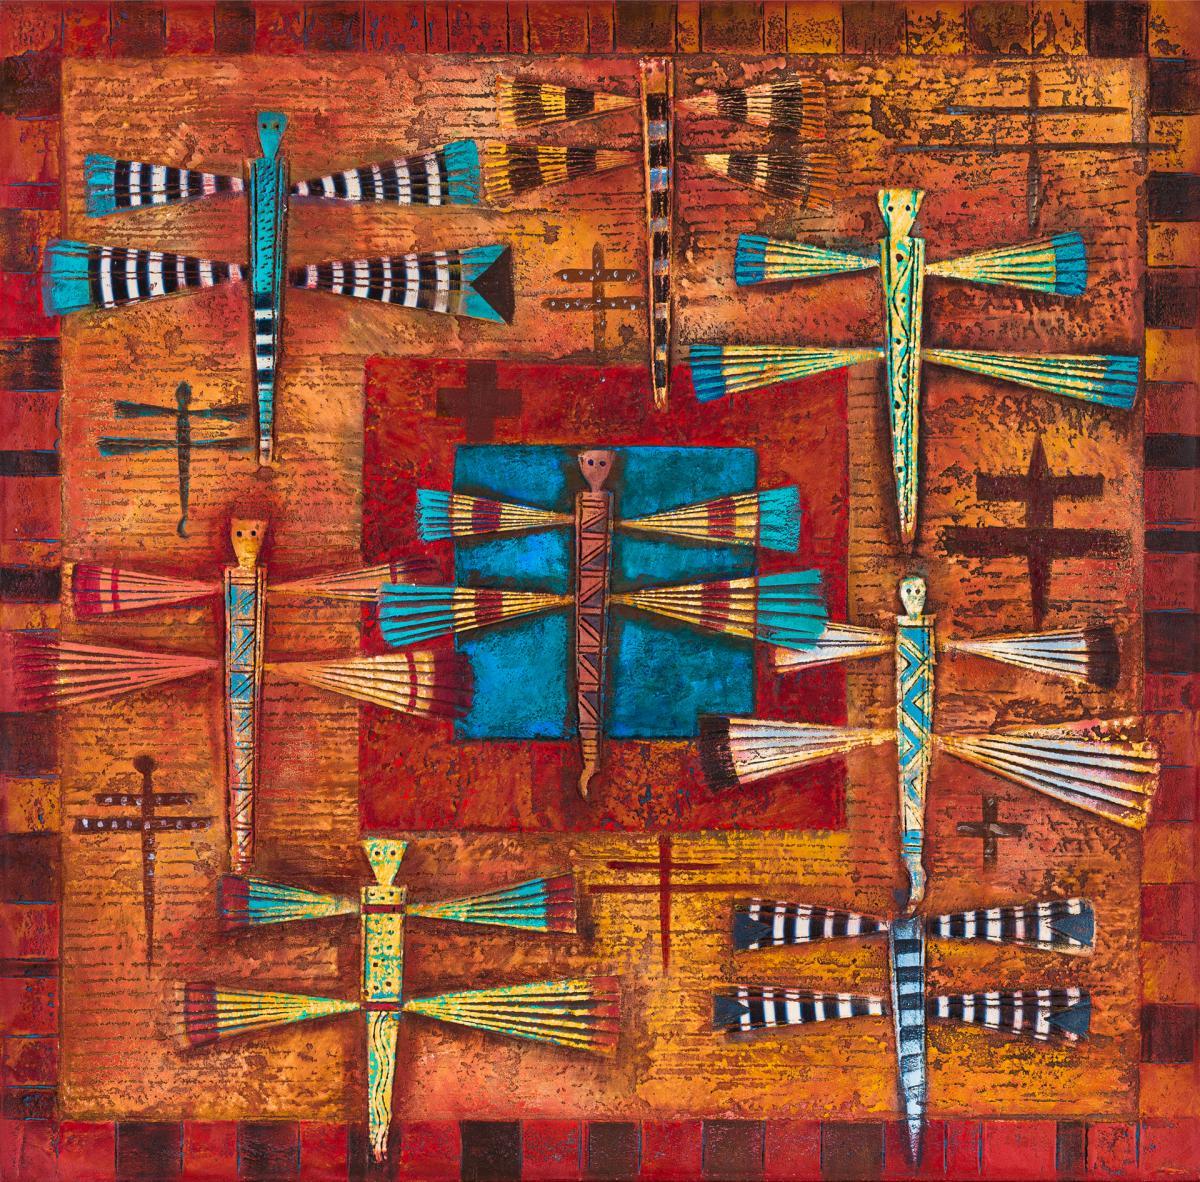 Dragonfly Constellation by Tony Abeyta